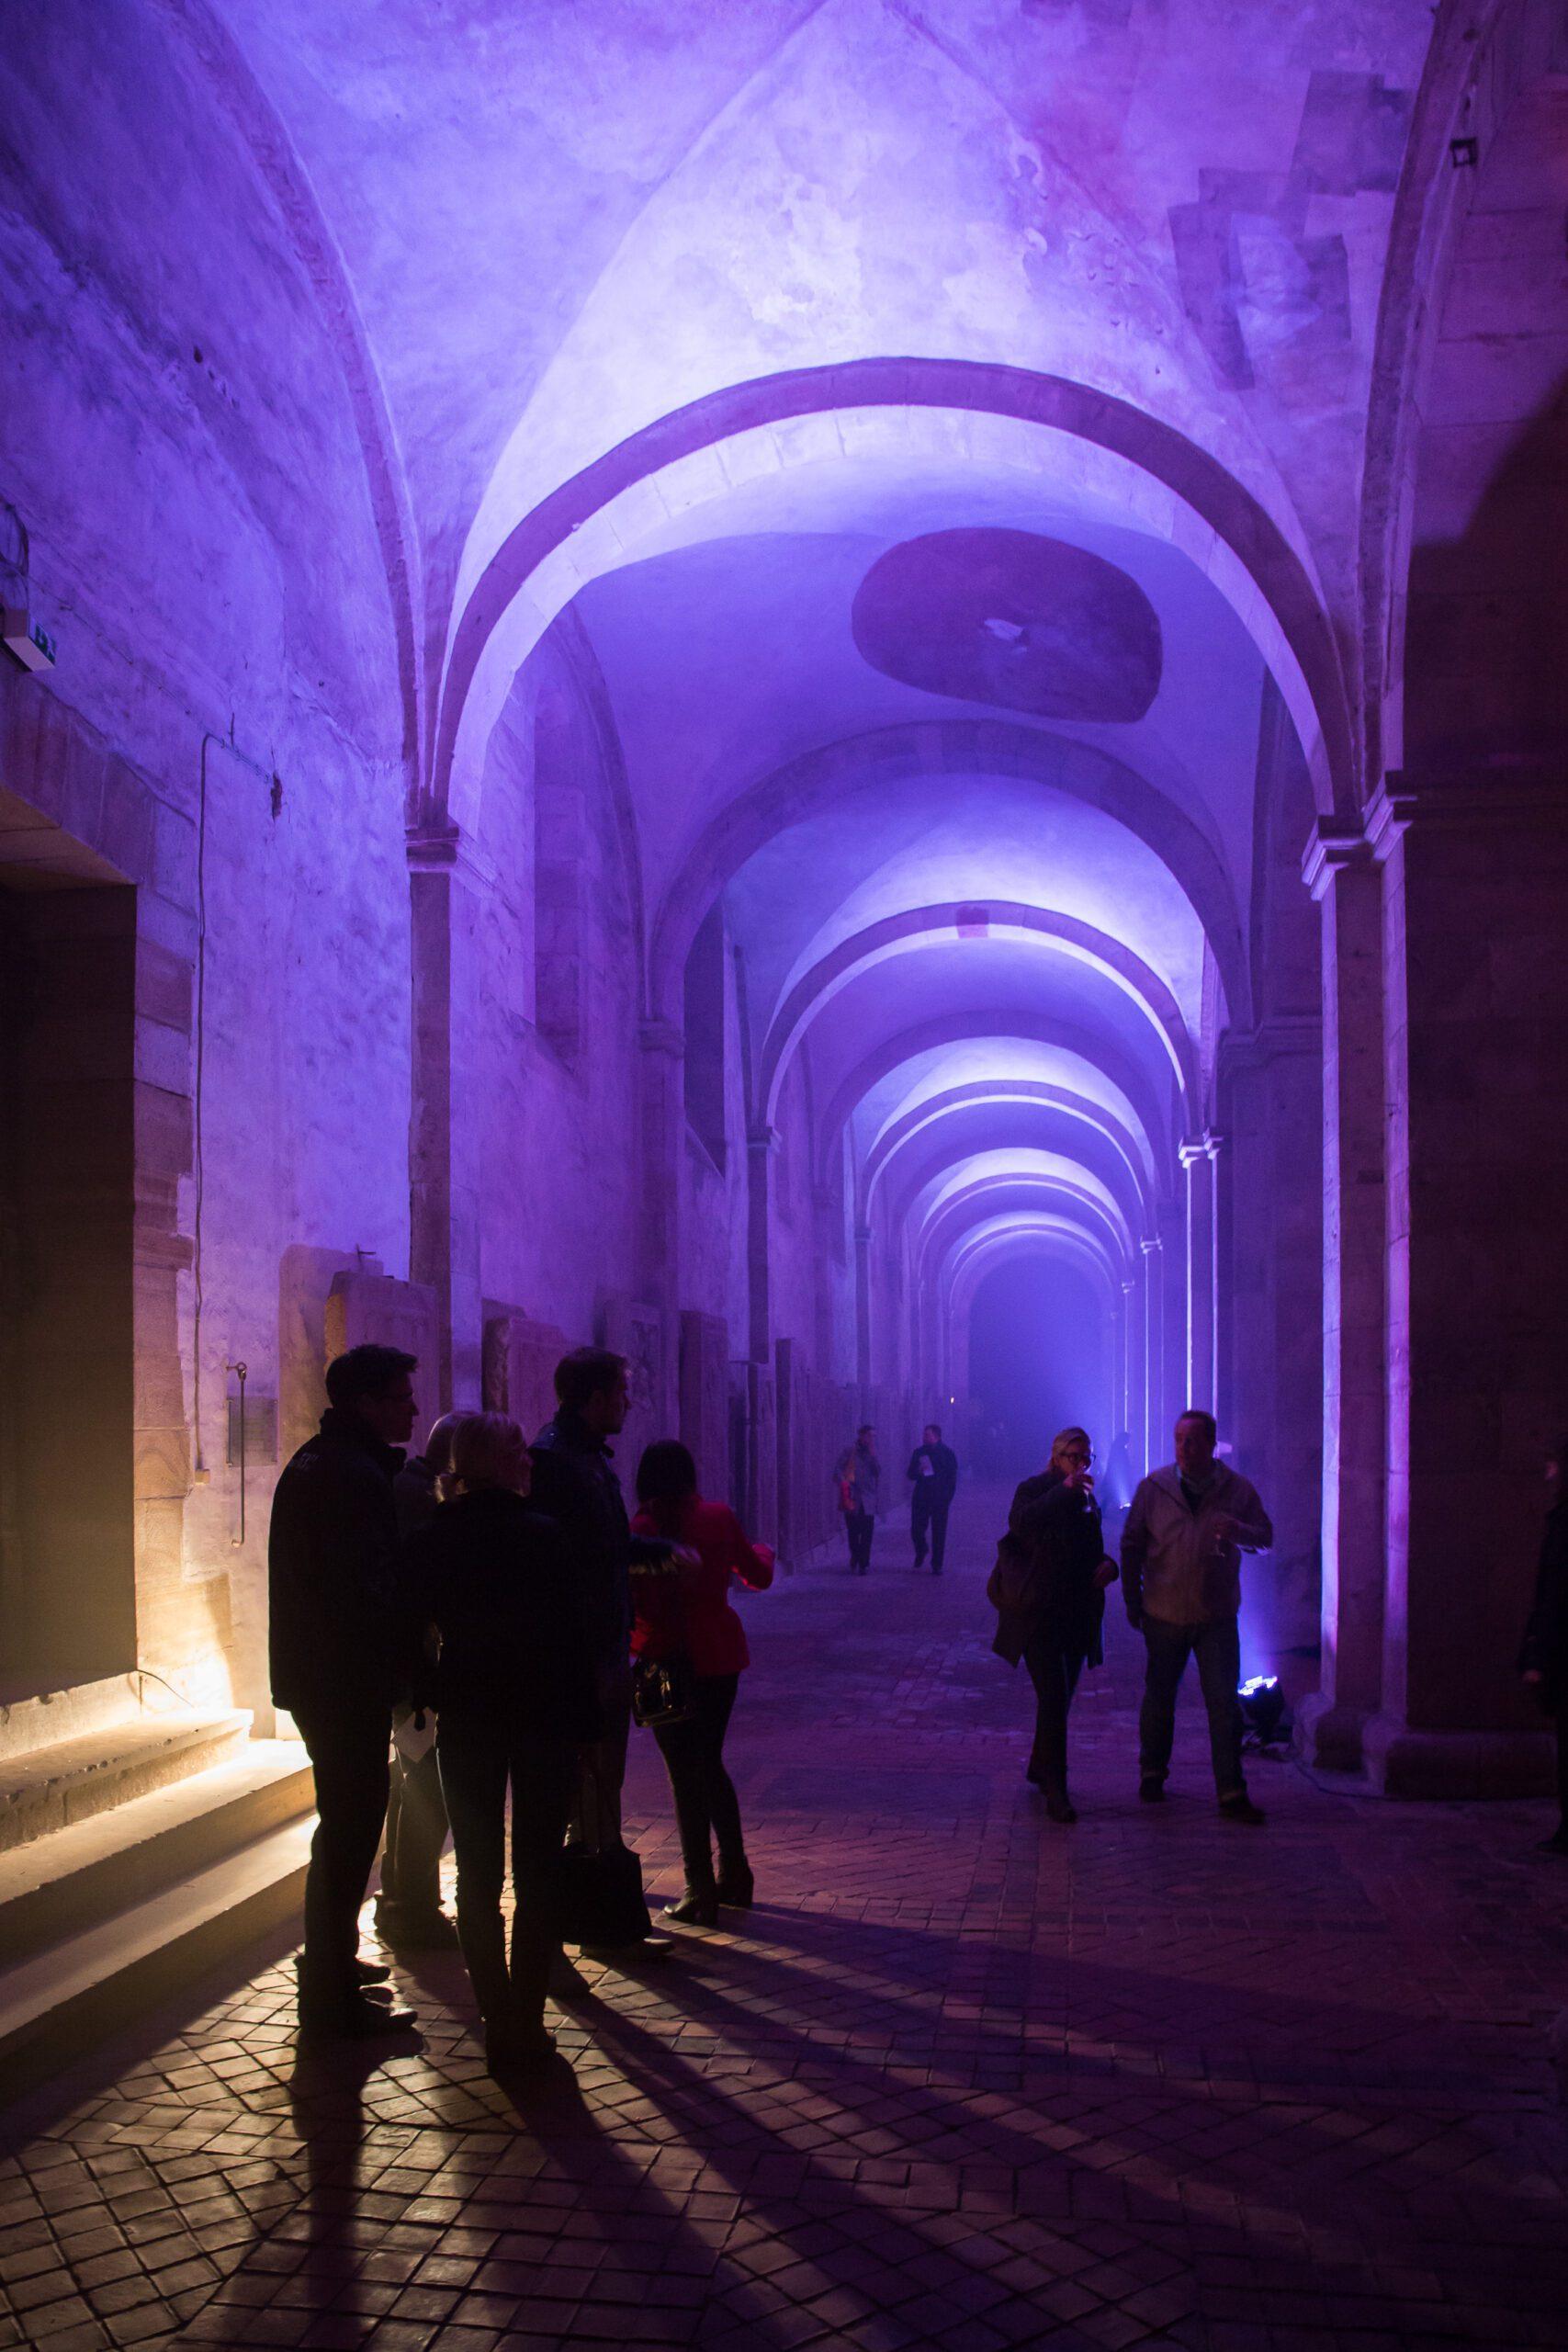 Jörg Schellschmidt - Eventfotografie - Lumostory Kloster Eberbach 2013